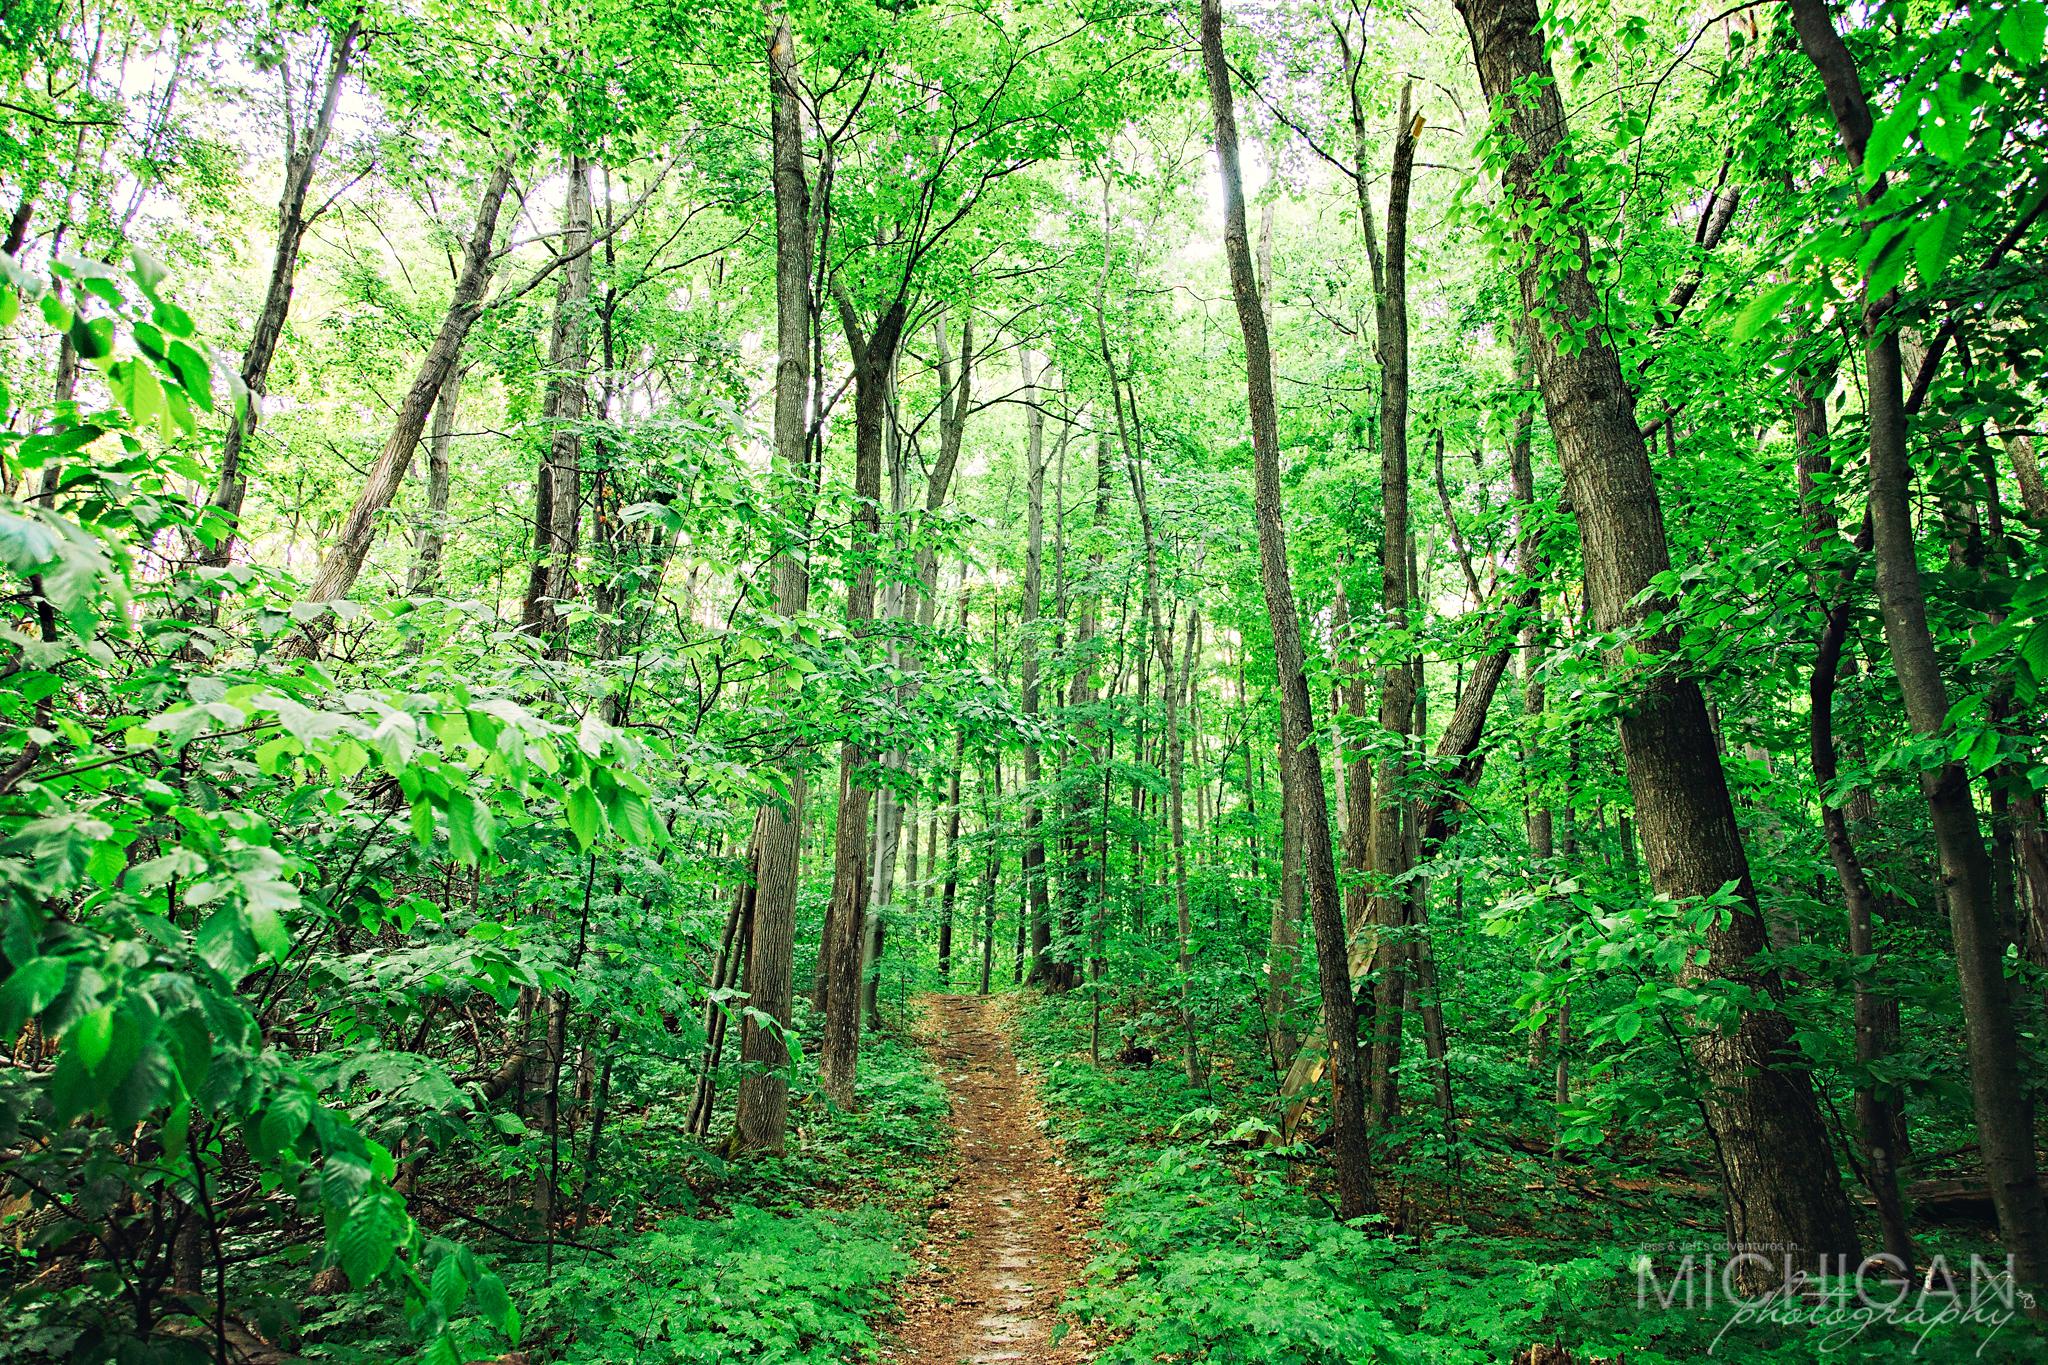 A trail scene along the path.